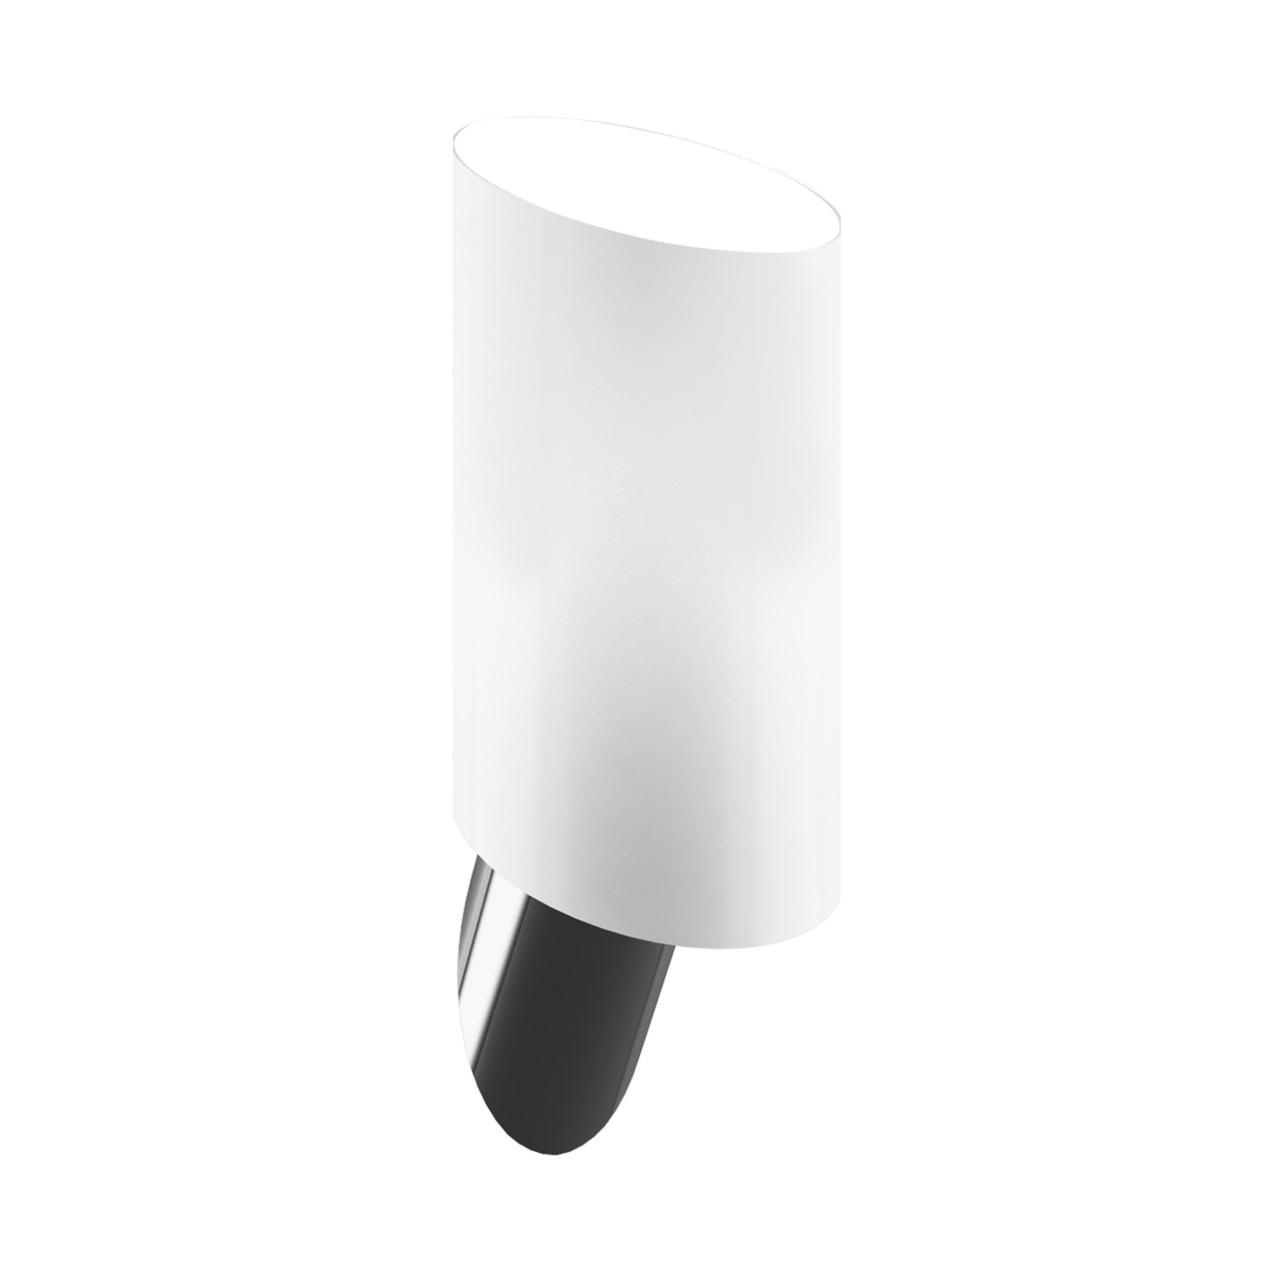 Светильник настенный Muro 1х40W E14 белый / никель Lightstar 808610